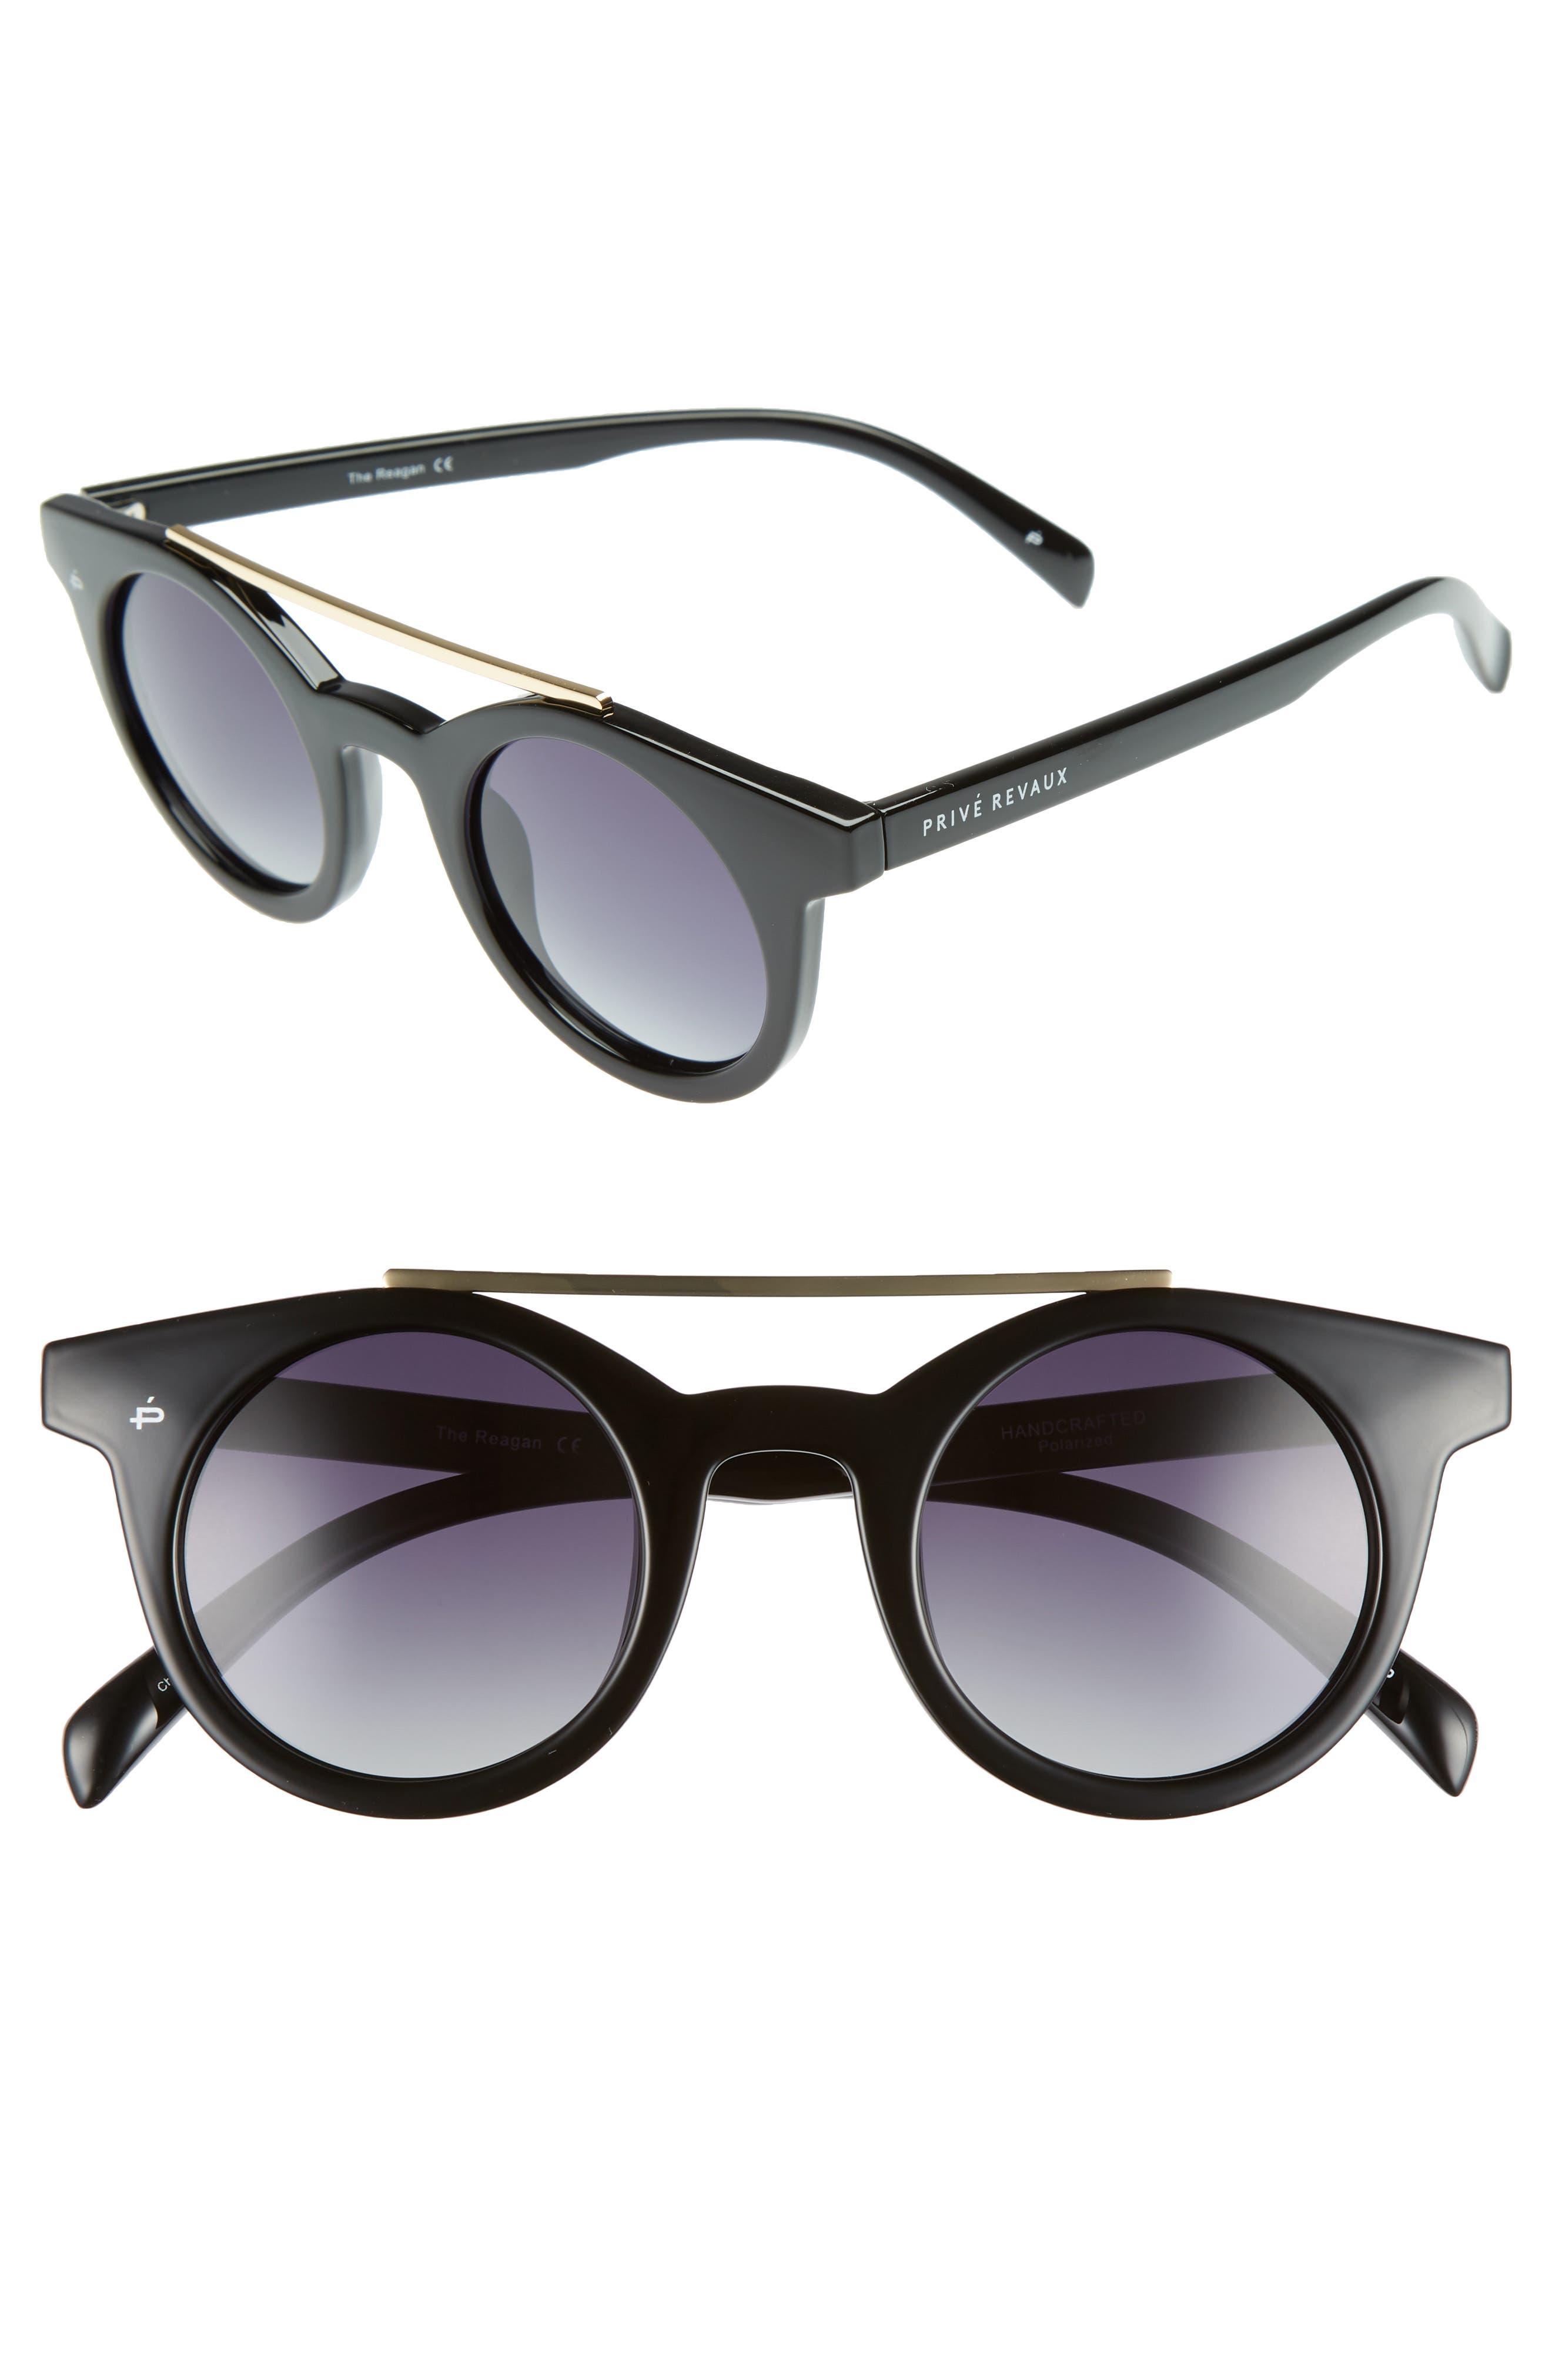 Privé Revaux The Reagan 43mm Polarized Round Sunglasses